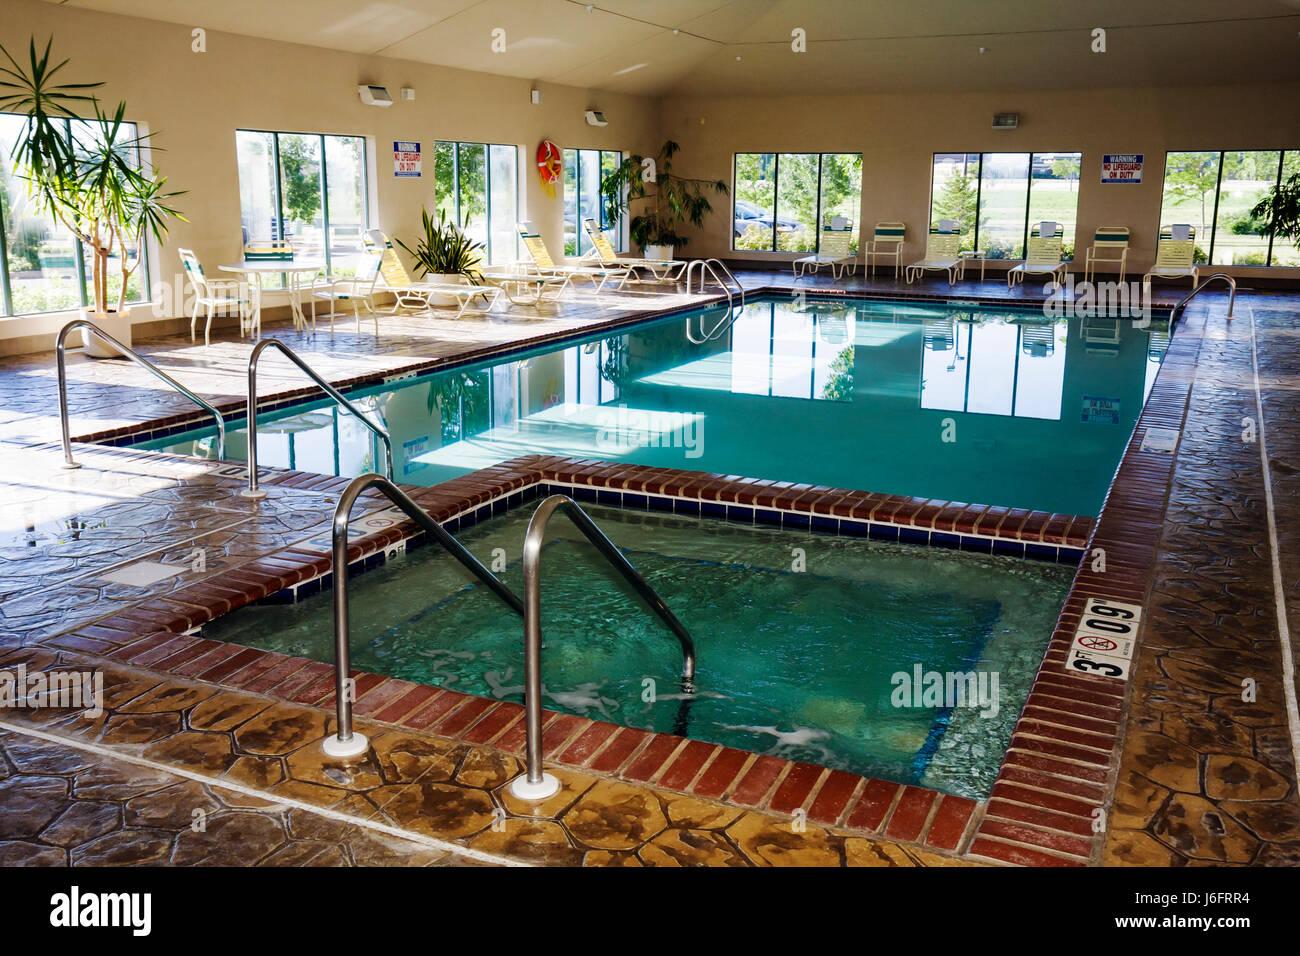 indoor swimming pool stockfotos indoor swimming pool bilder alamy. Black Bedroom Furniture Sets. Home Design Ideas